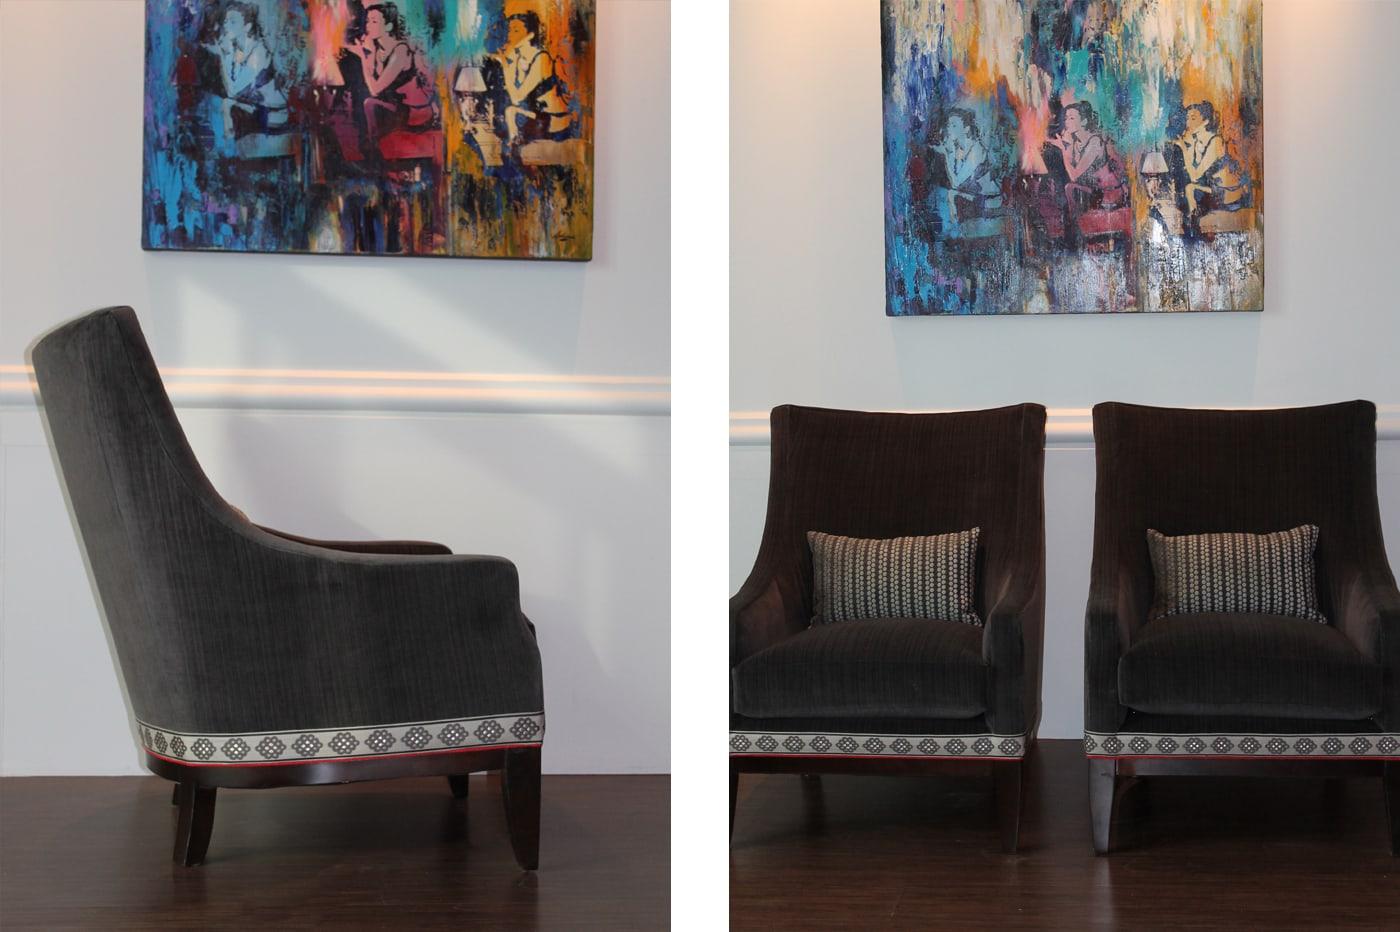 black furniture, colorful wall art